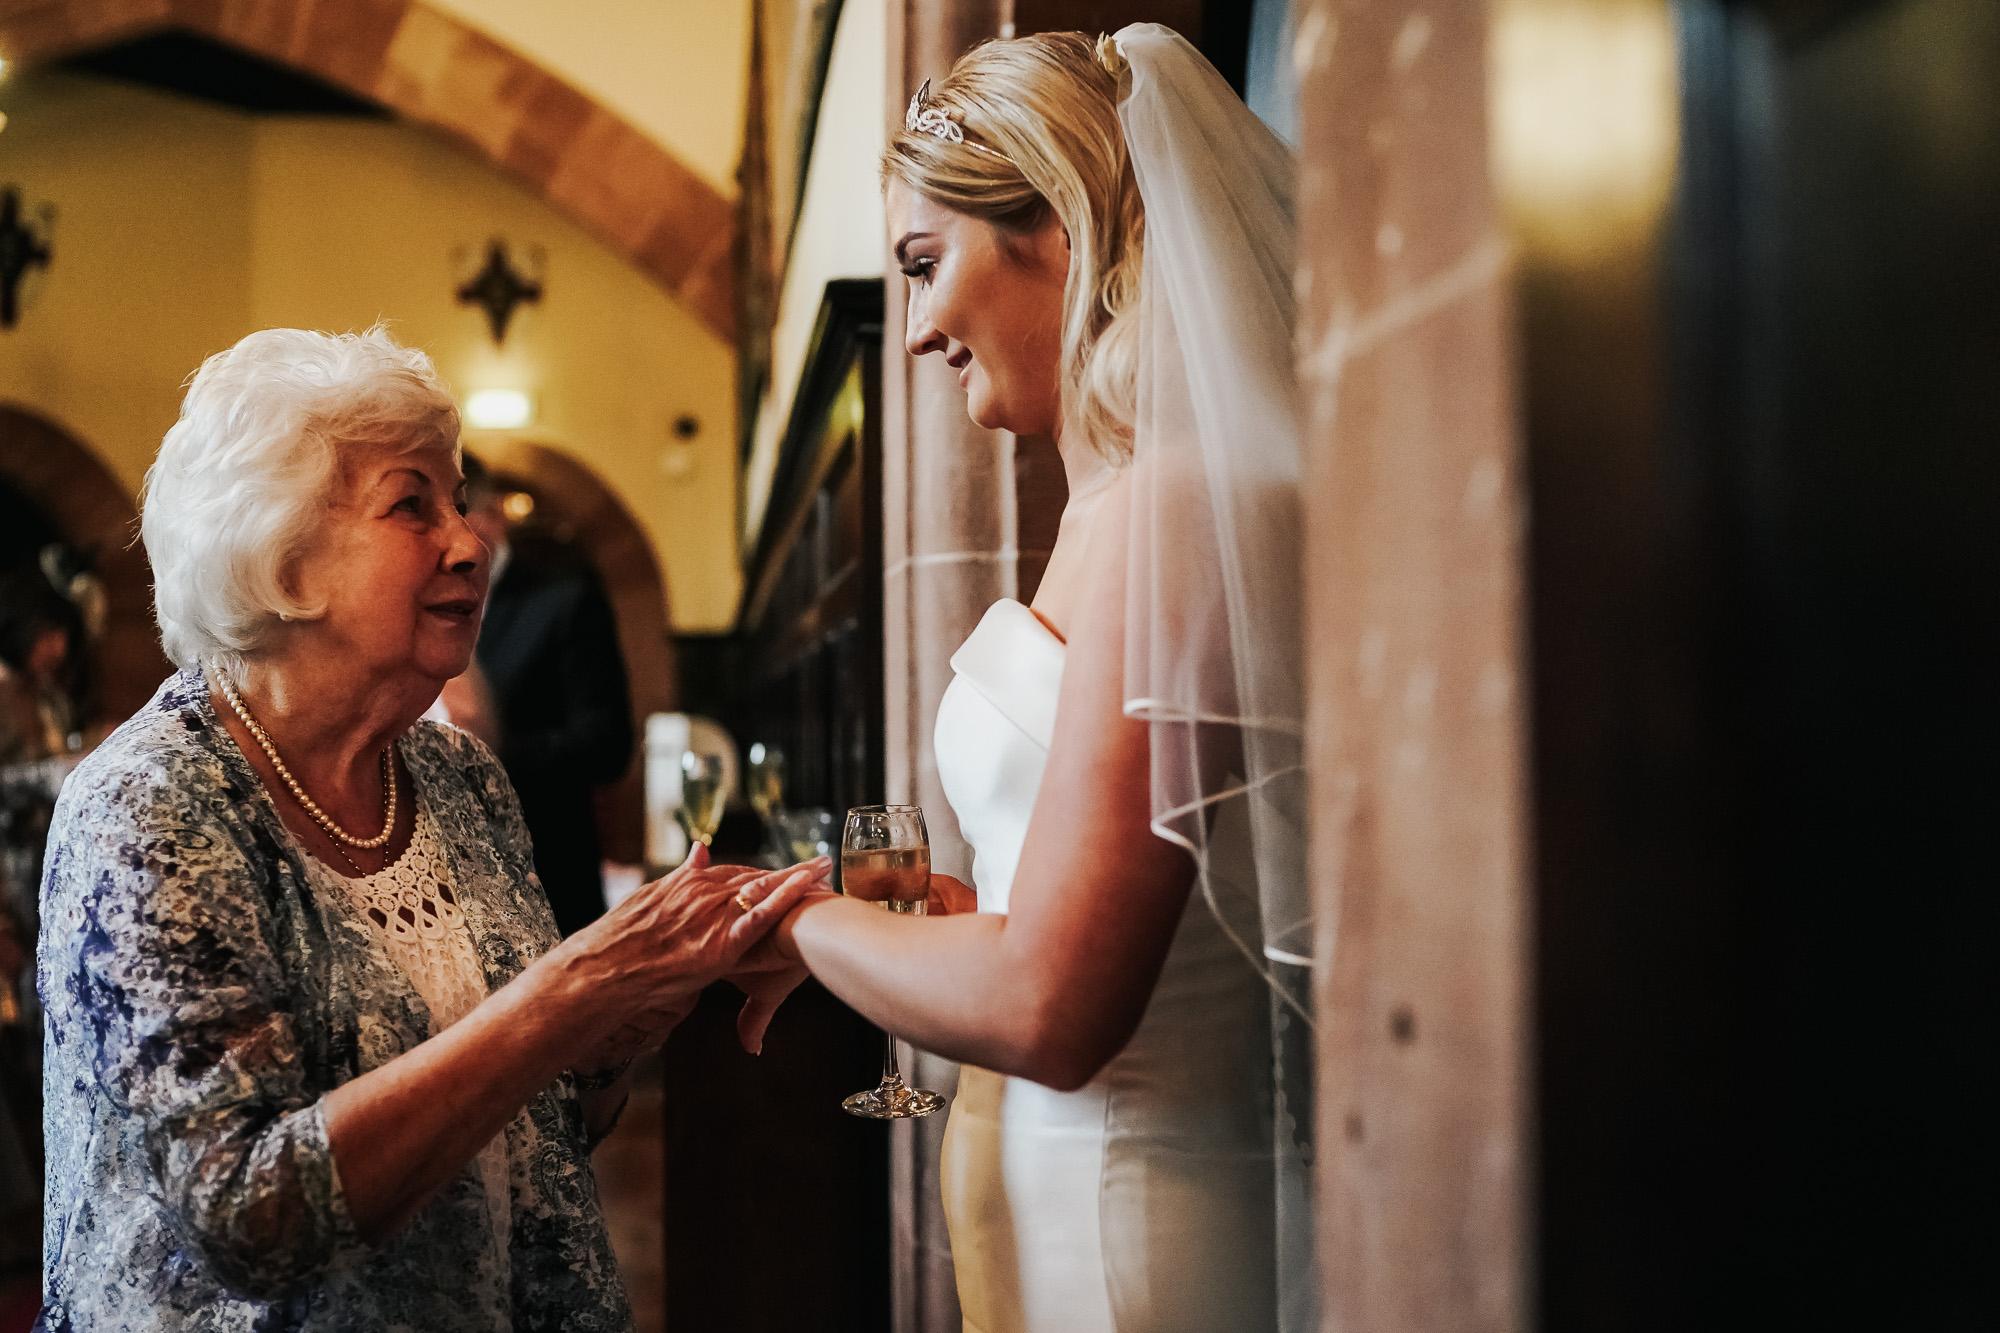 Peckforton Castle wedding photography cheshire wedding photographer (26 of 57).jpg